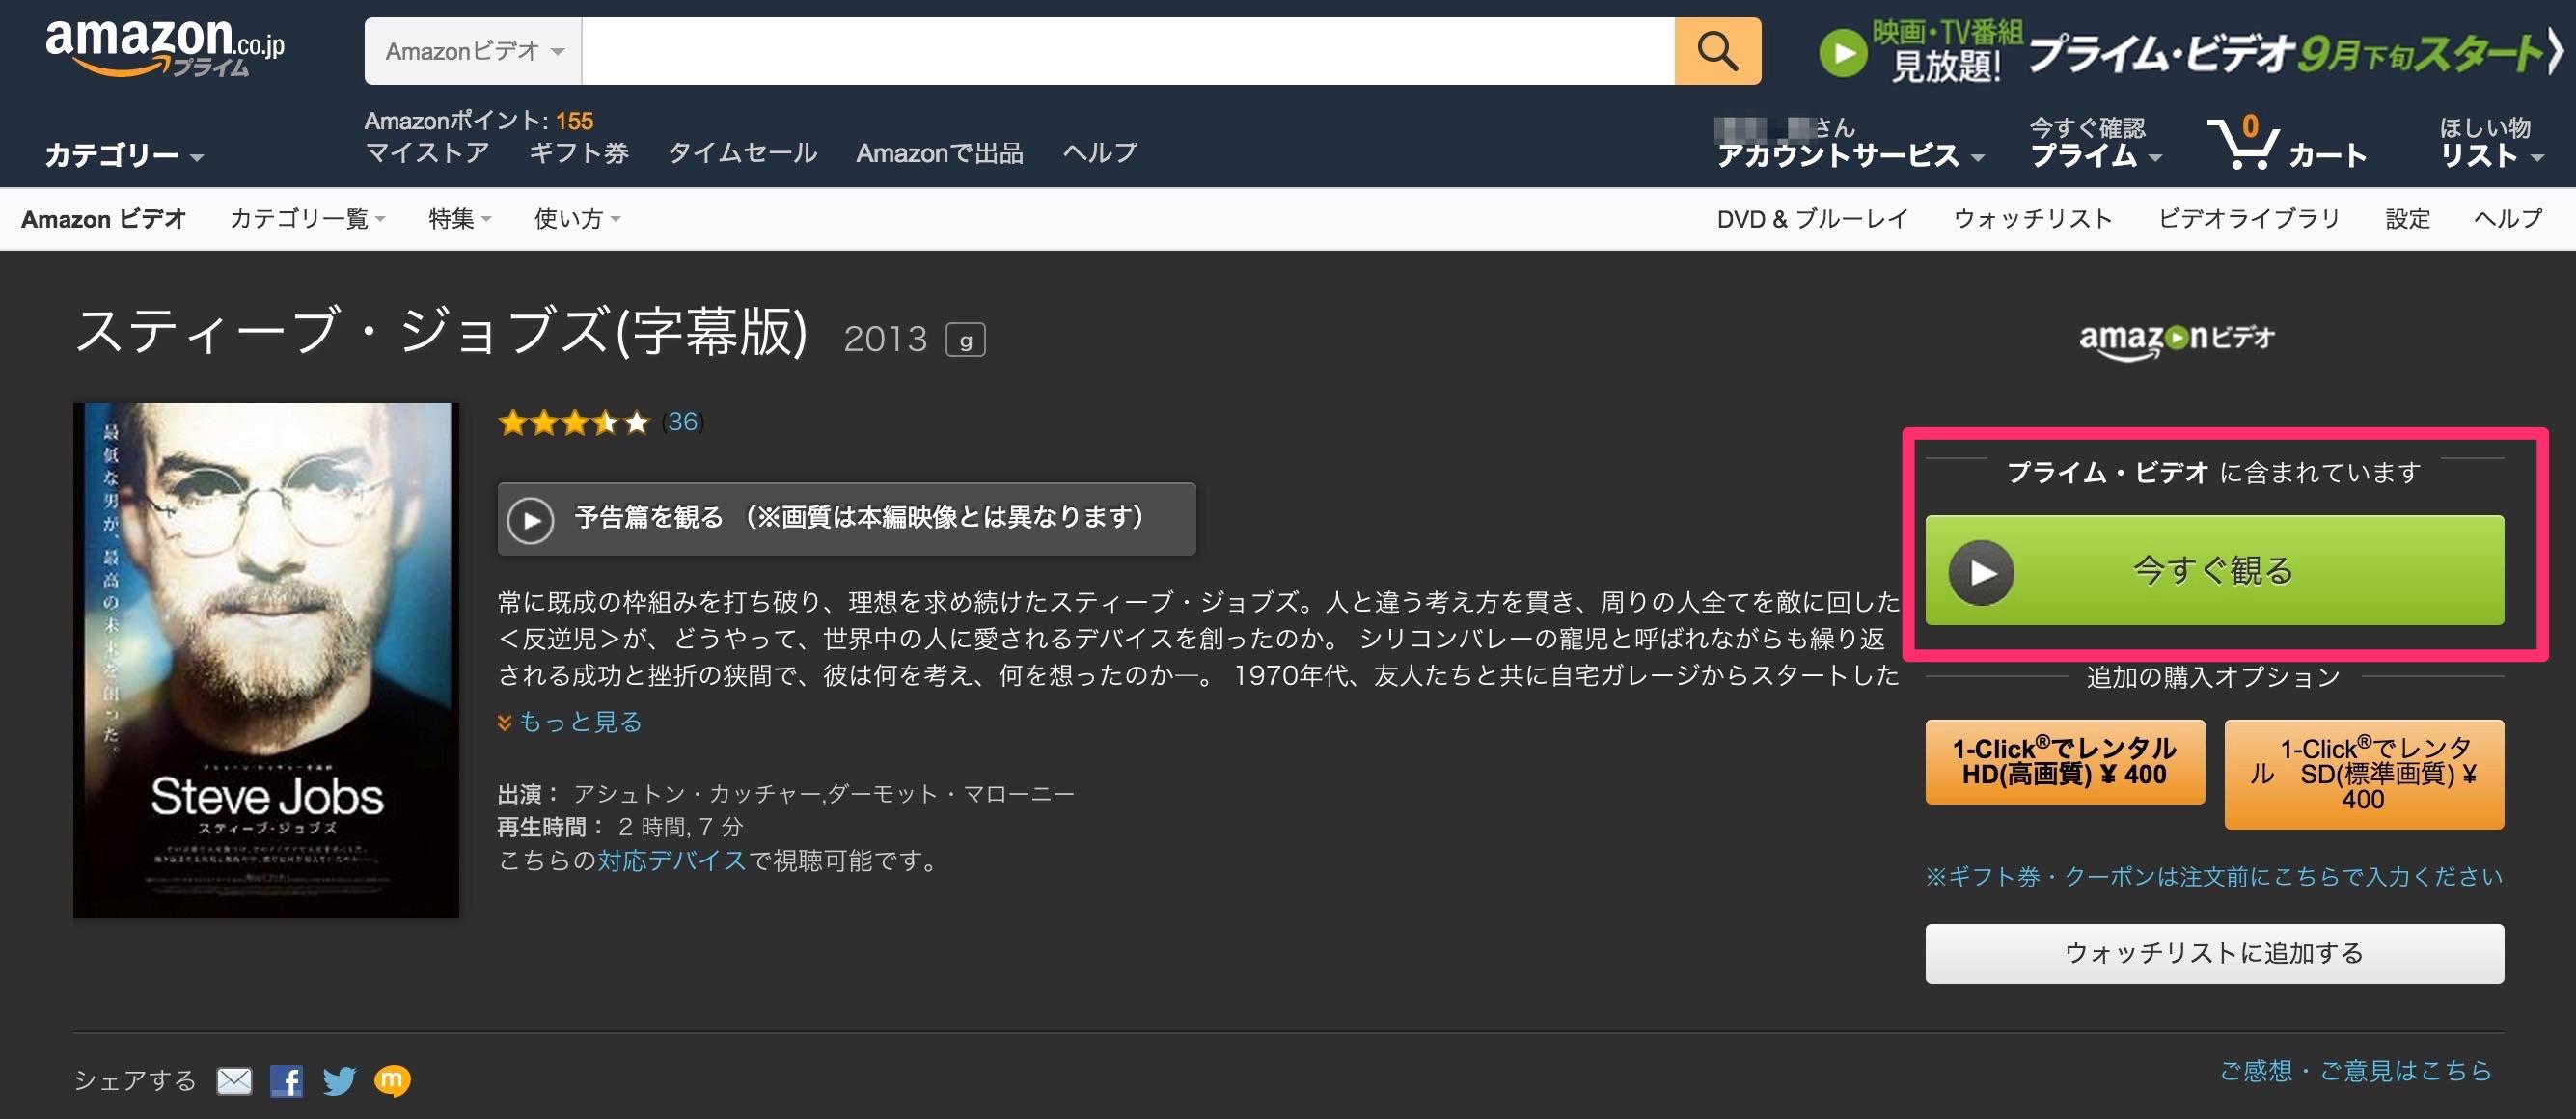 amazonプライムビデオスタート!無料ビデオを見る方法はこちら